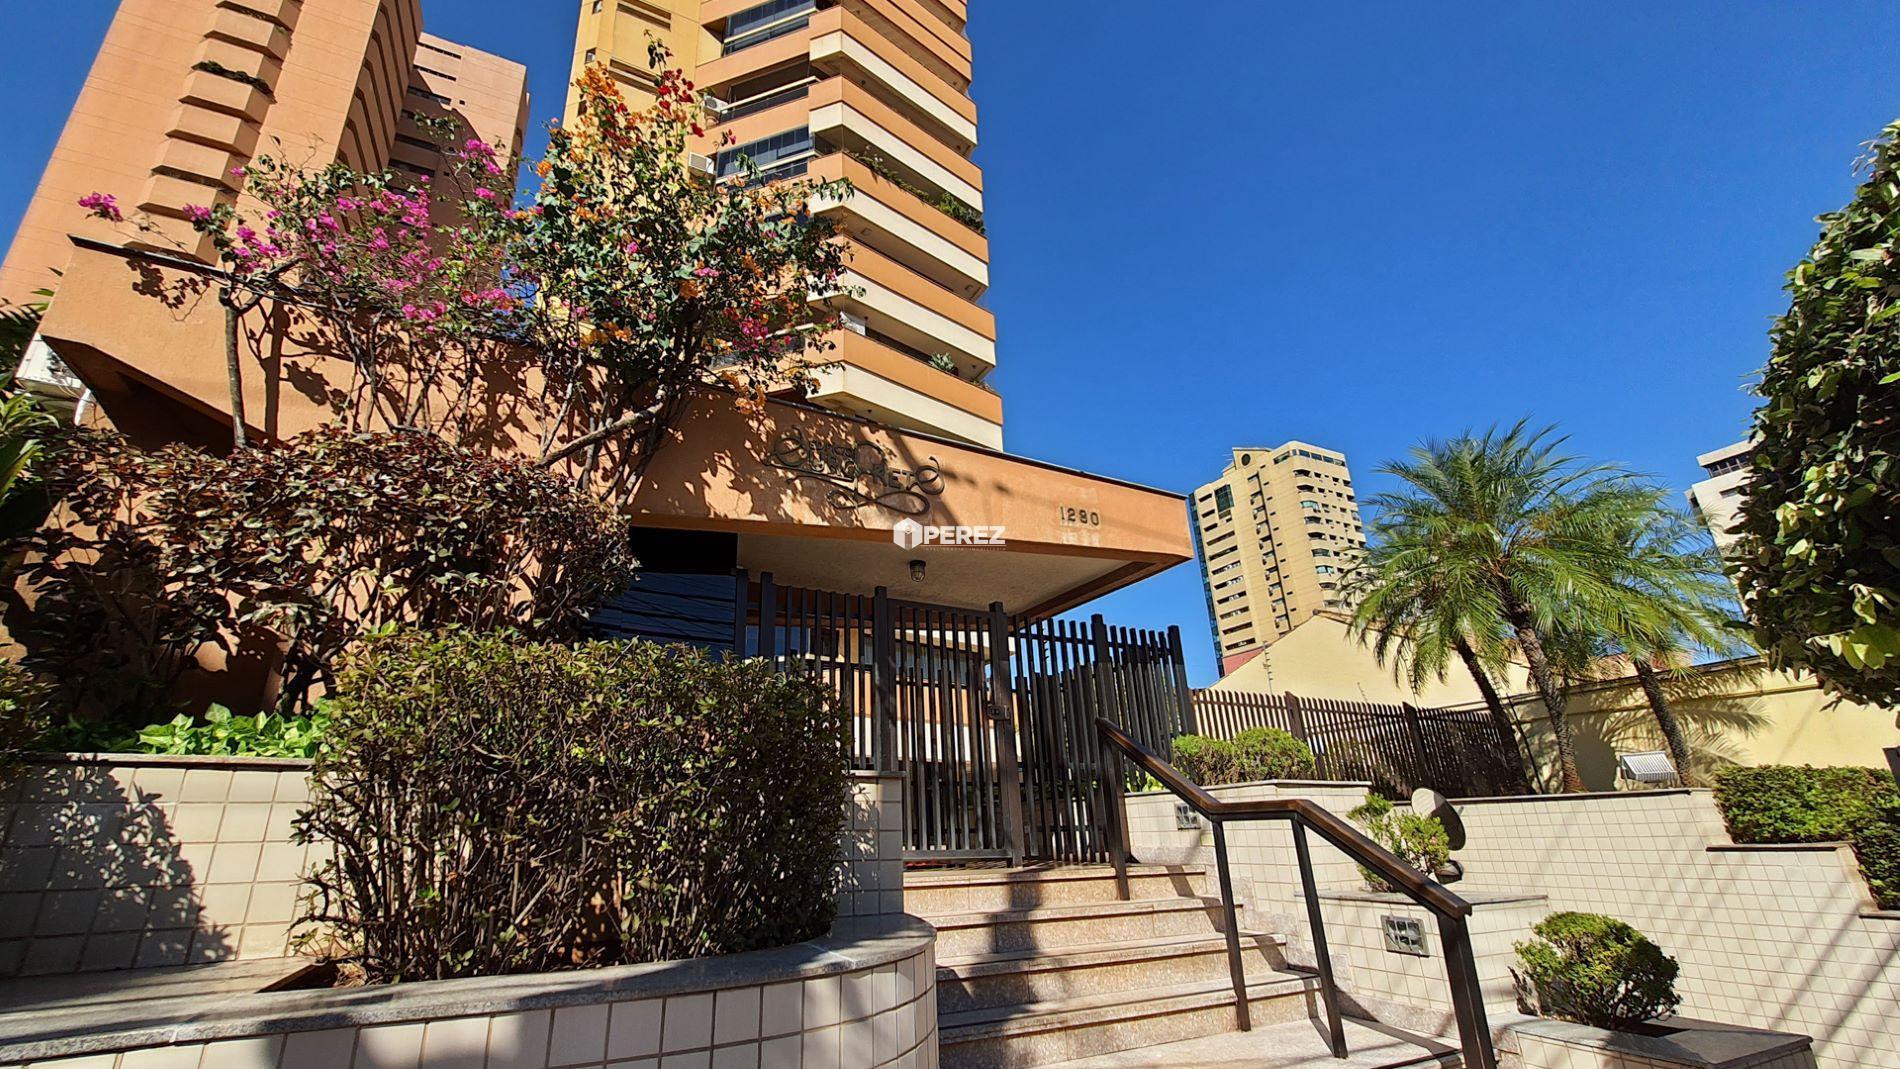 aluguel-campo-grande-ms-apartamento-maracaju-centro-perez-imoveis